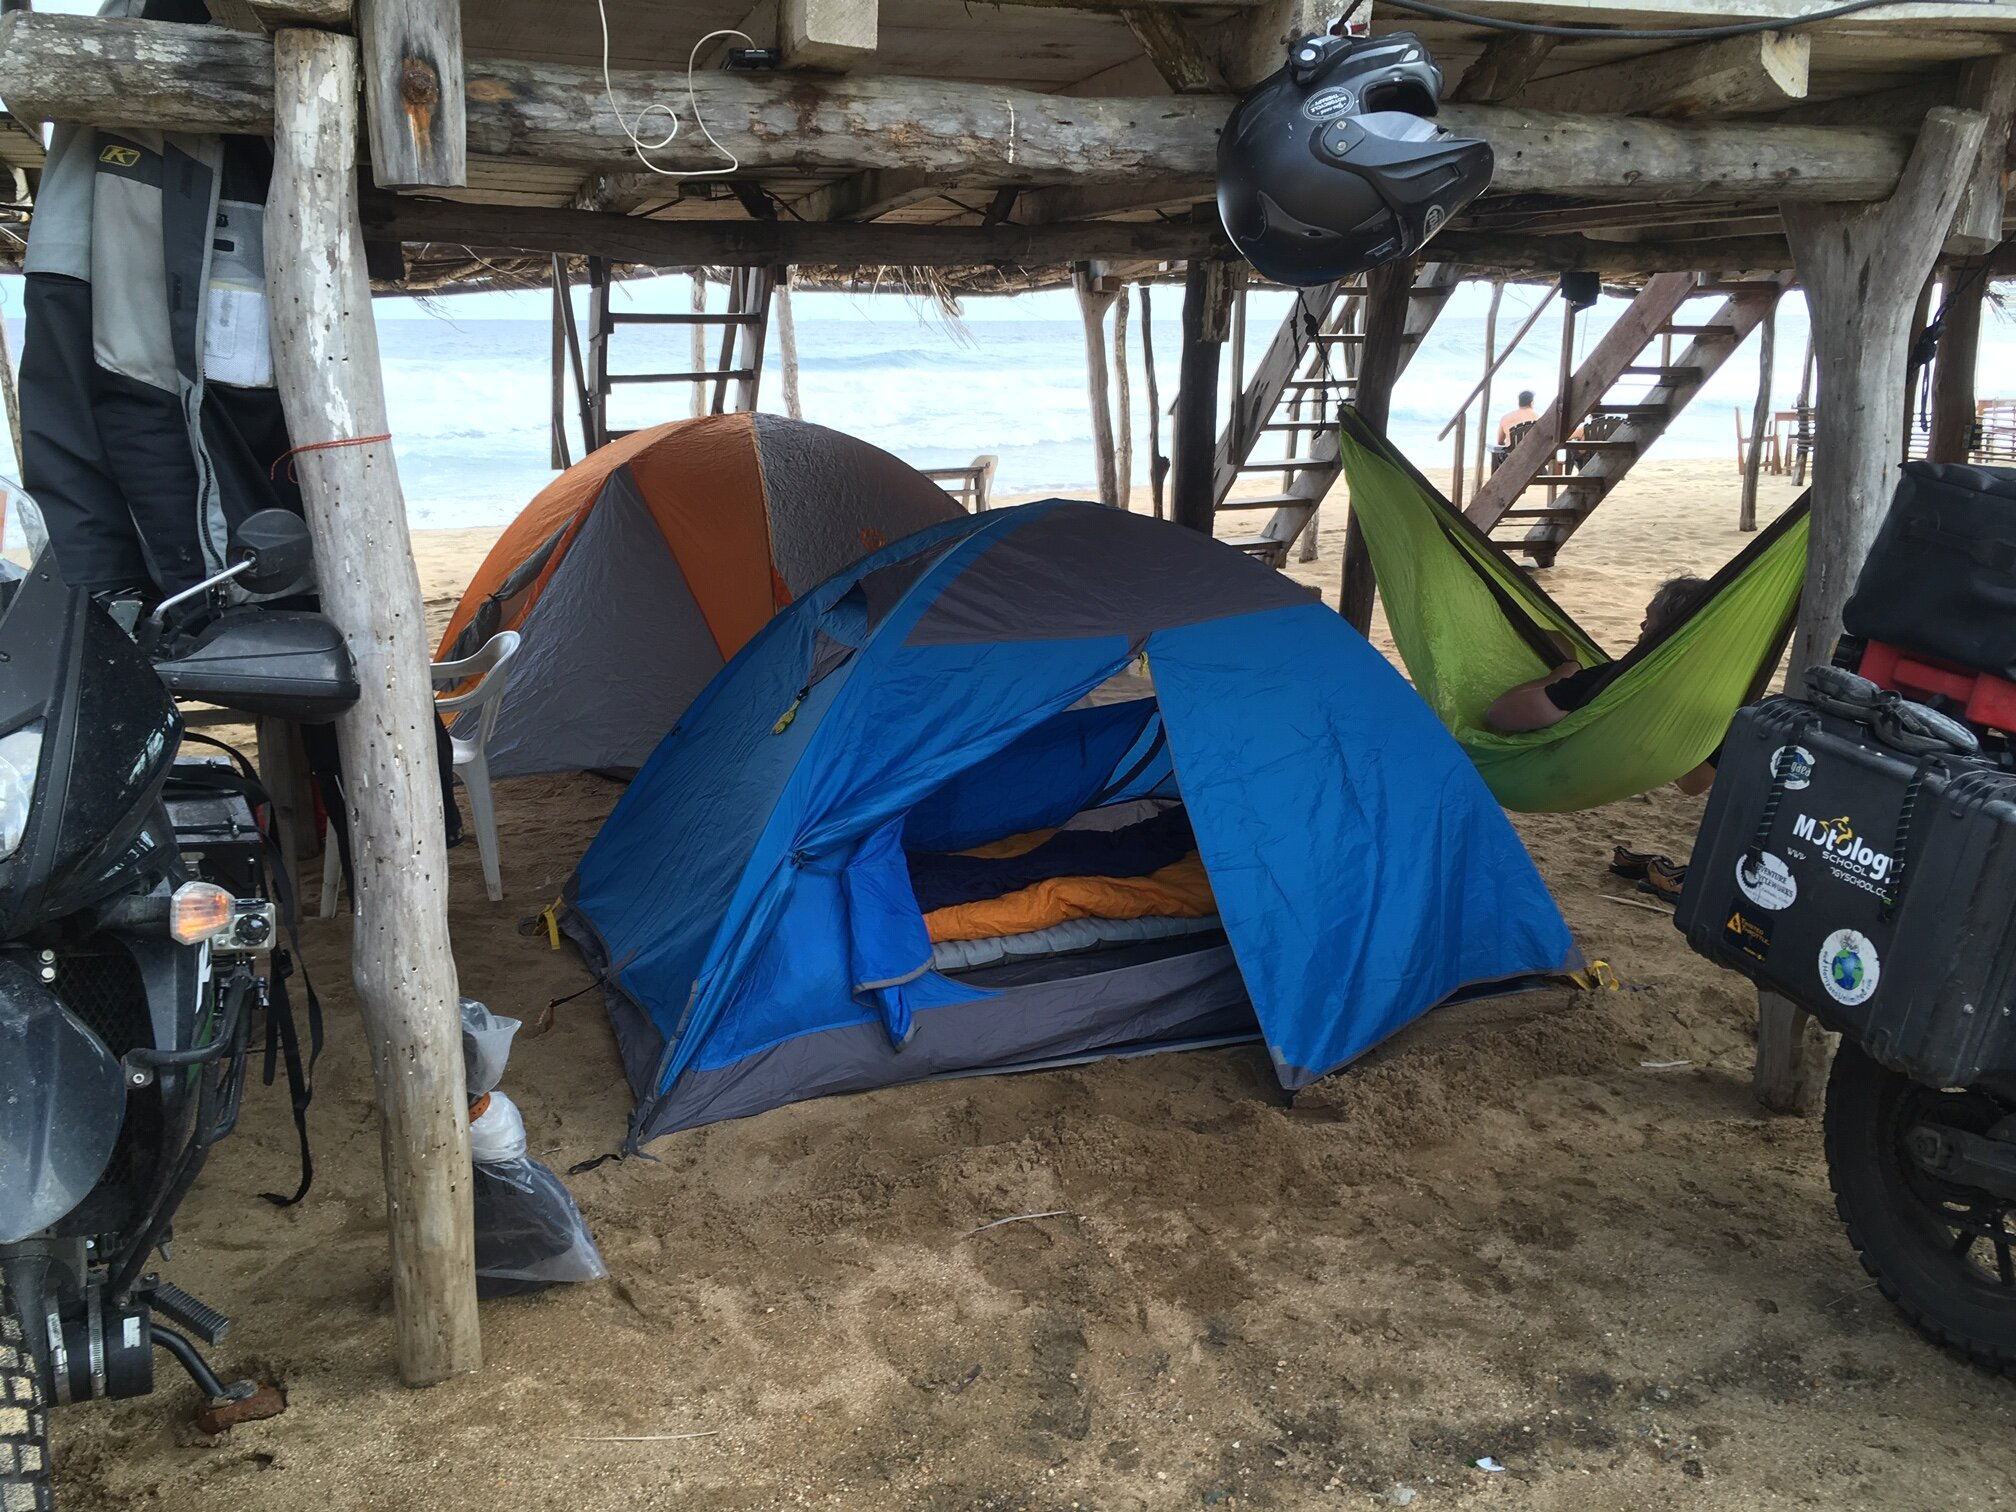 Image: Jeremy Kroeker and Elle West - Tents on the beach (Puerto Angel, Oaxaca, Mexico.